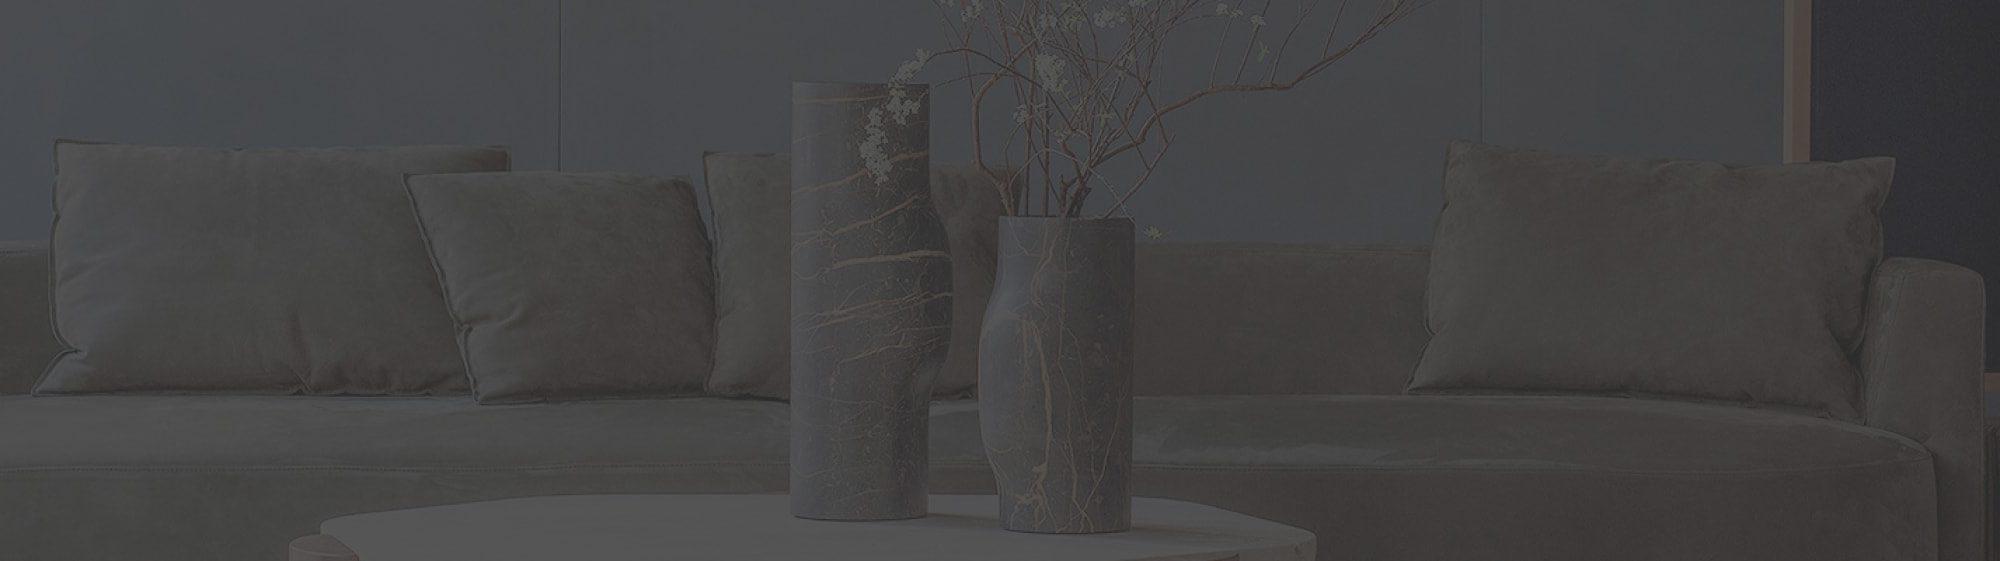 kookudesign-banner